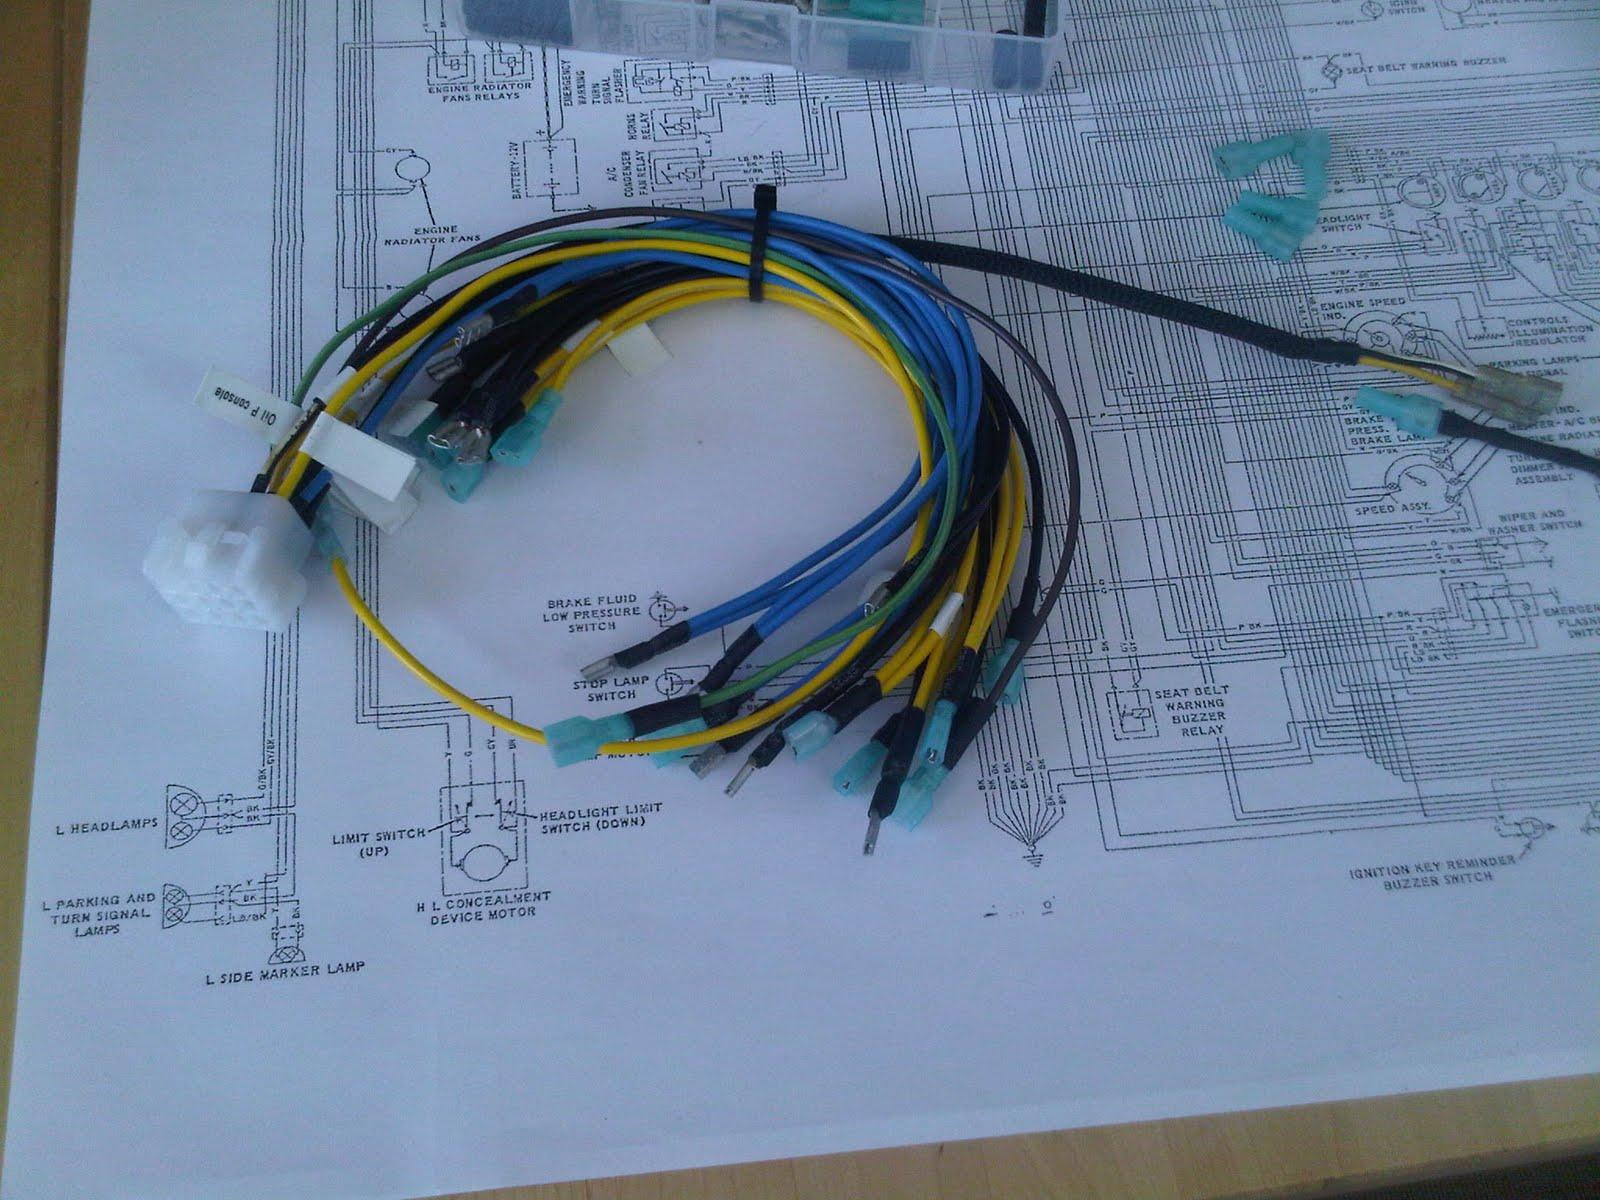 medium resolution of detomaso pantera wiring diagram wire data schema u2022 arctic cat snowmobile belt chart 1998 550